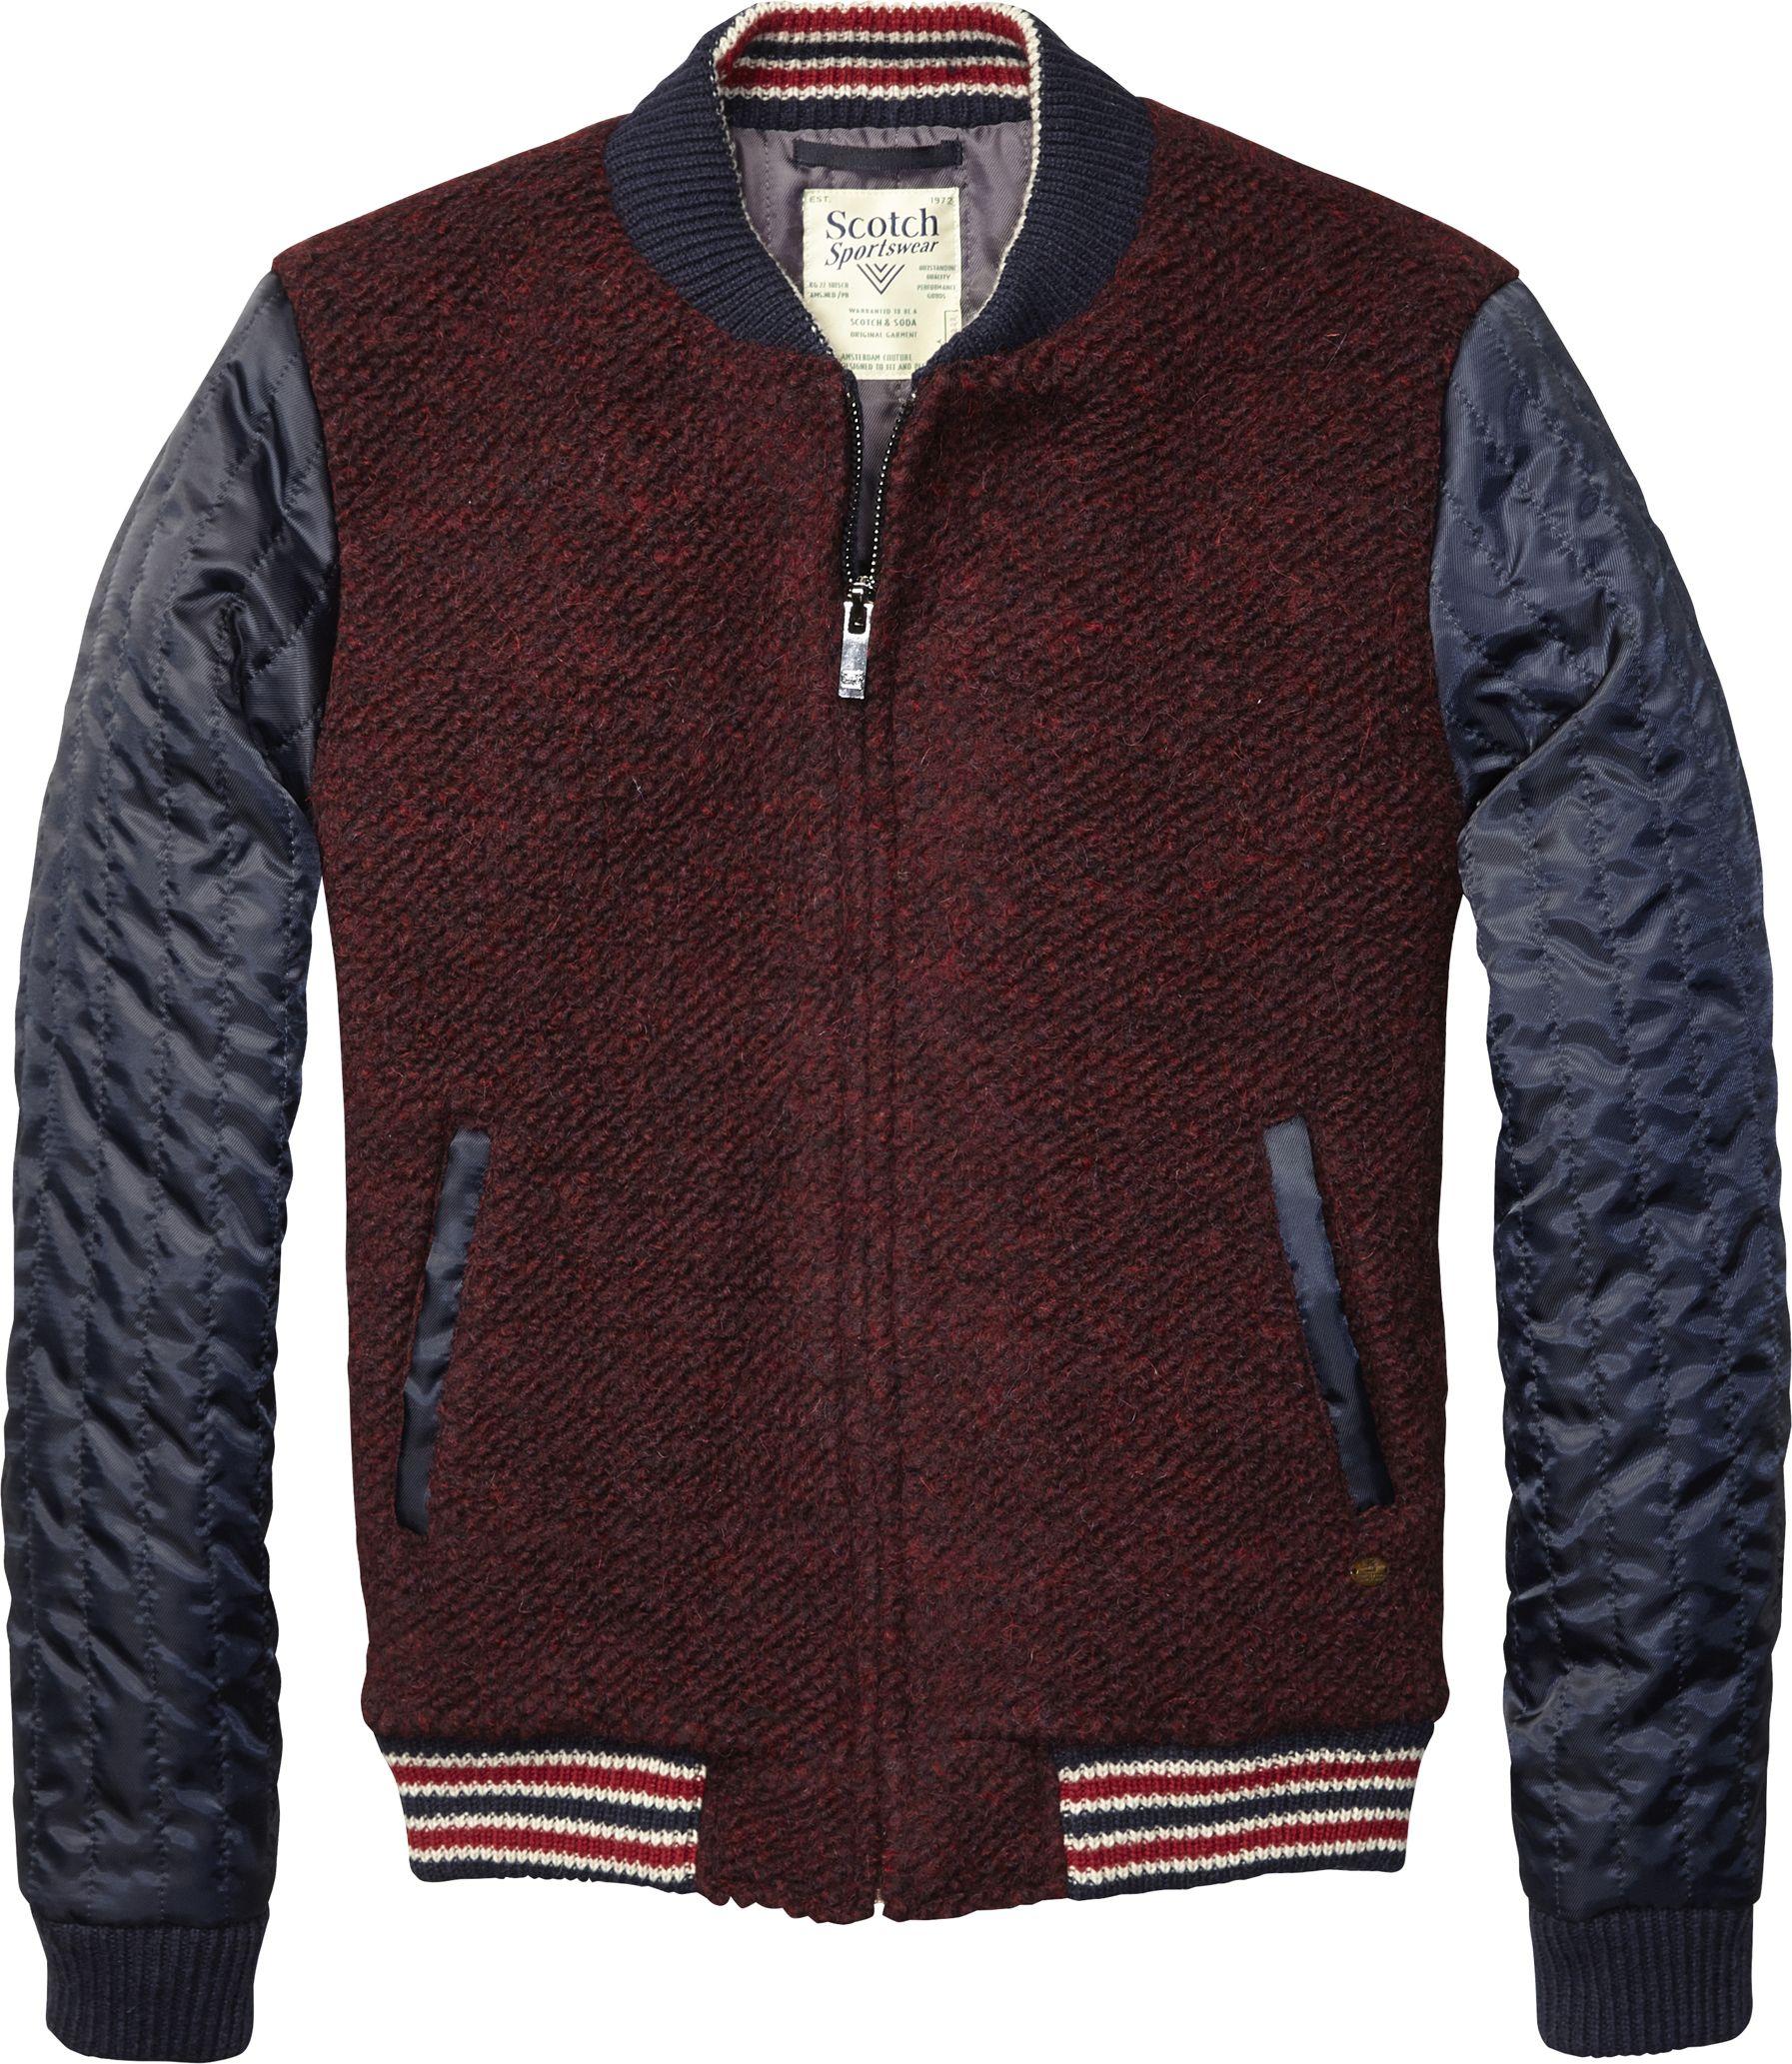 Comprar chaqueta bomber hombre